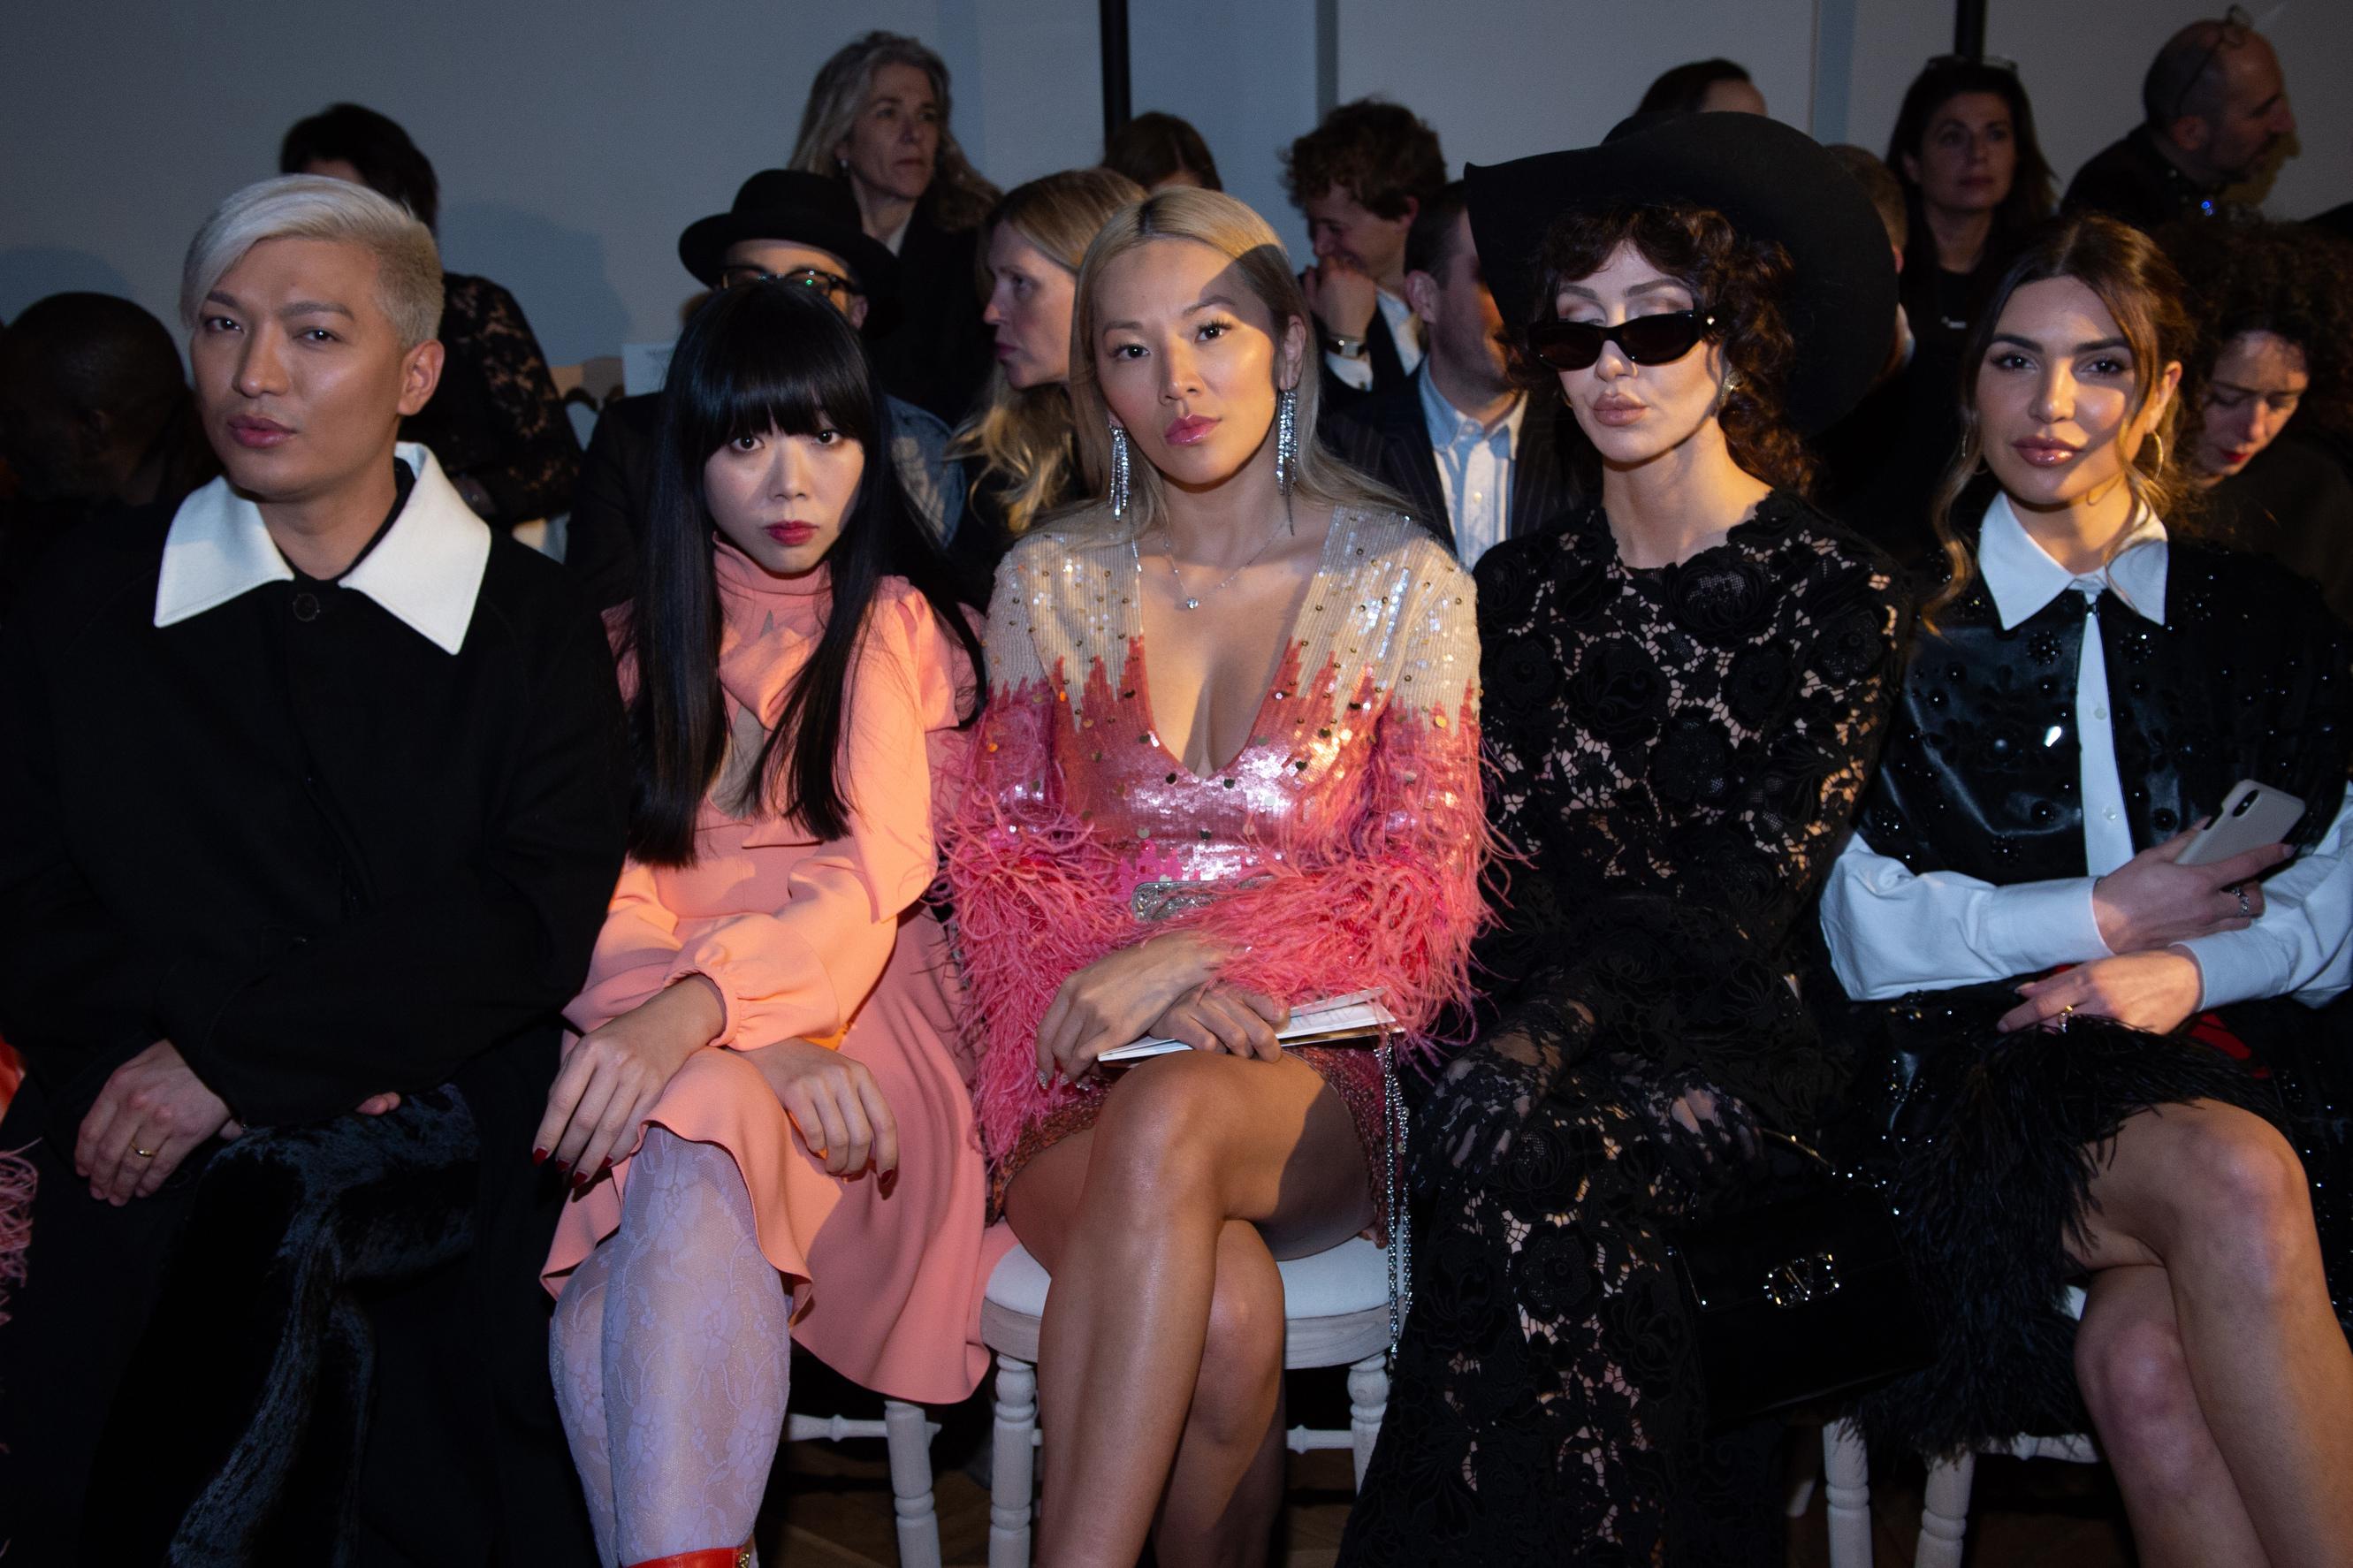 Bryan Yambao, Susie Lau, Tina Leung, Nadia Lee Cohen et Negin Mirsalehi